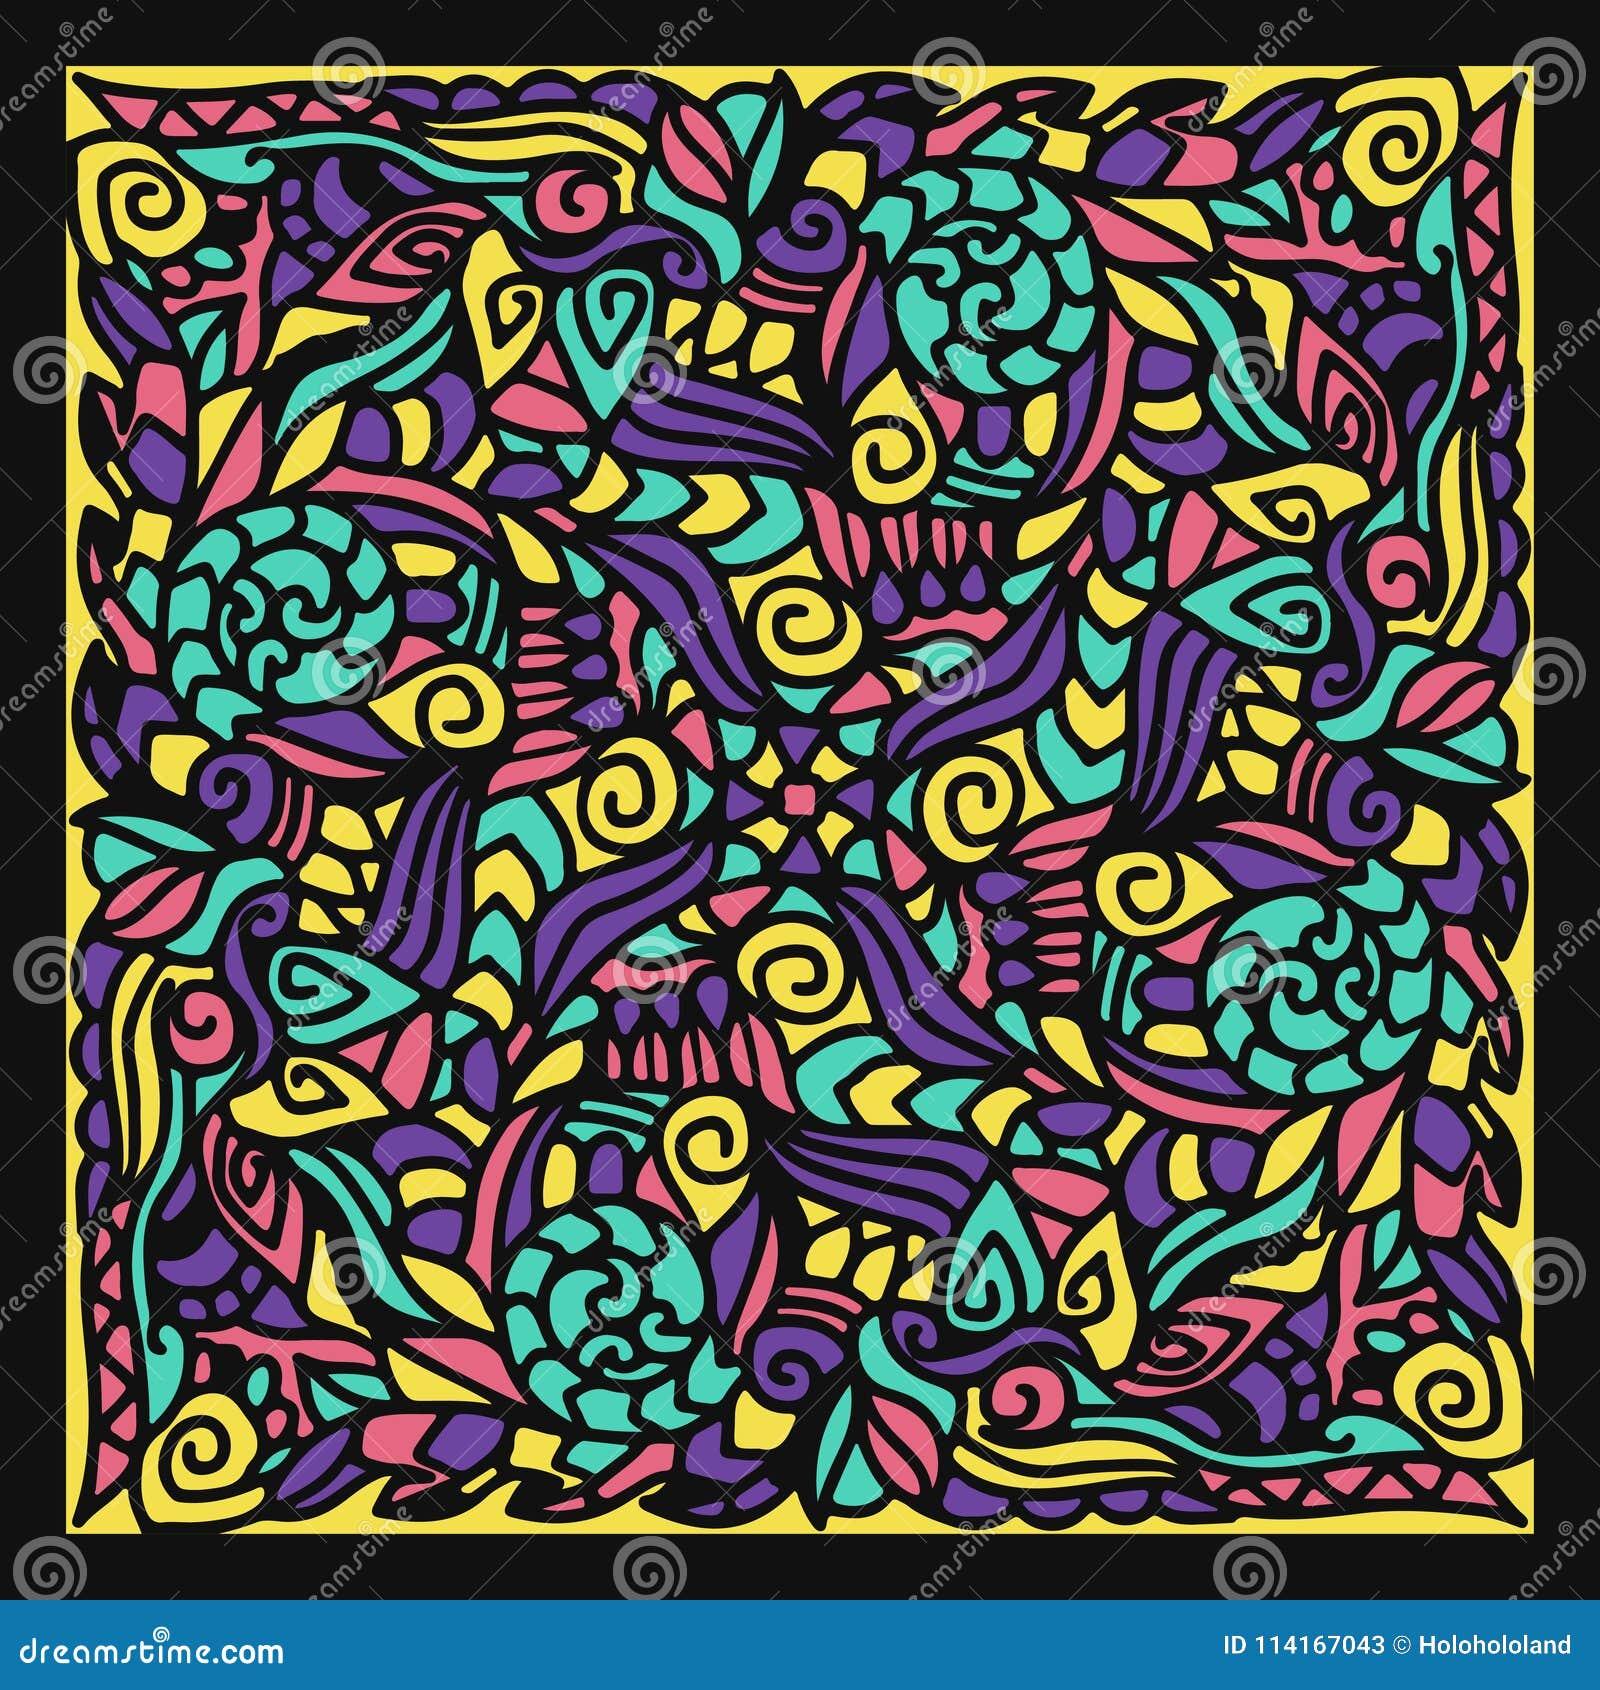 Scarf pattern stock vector. Illustration of wallpaper - 114167043